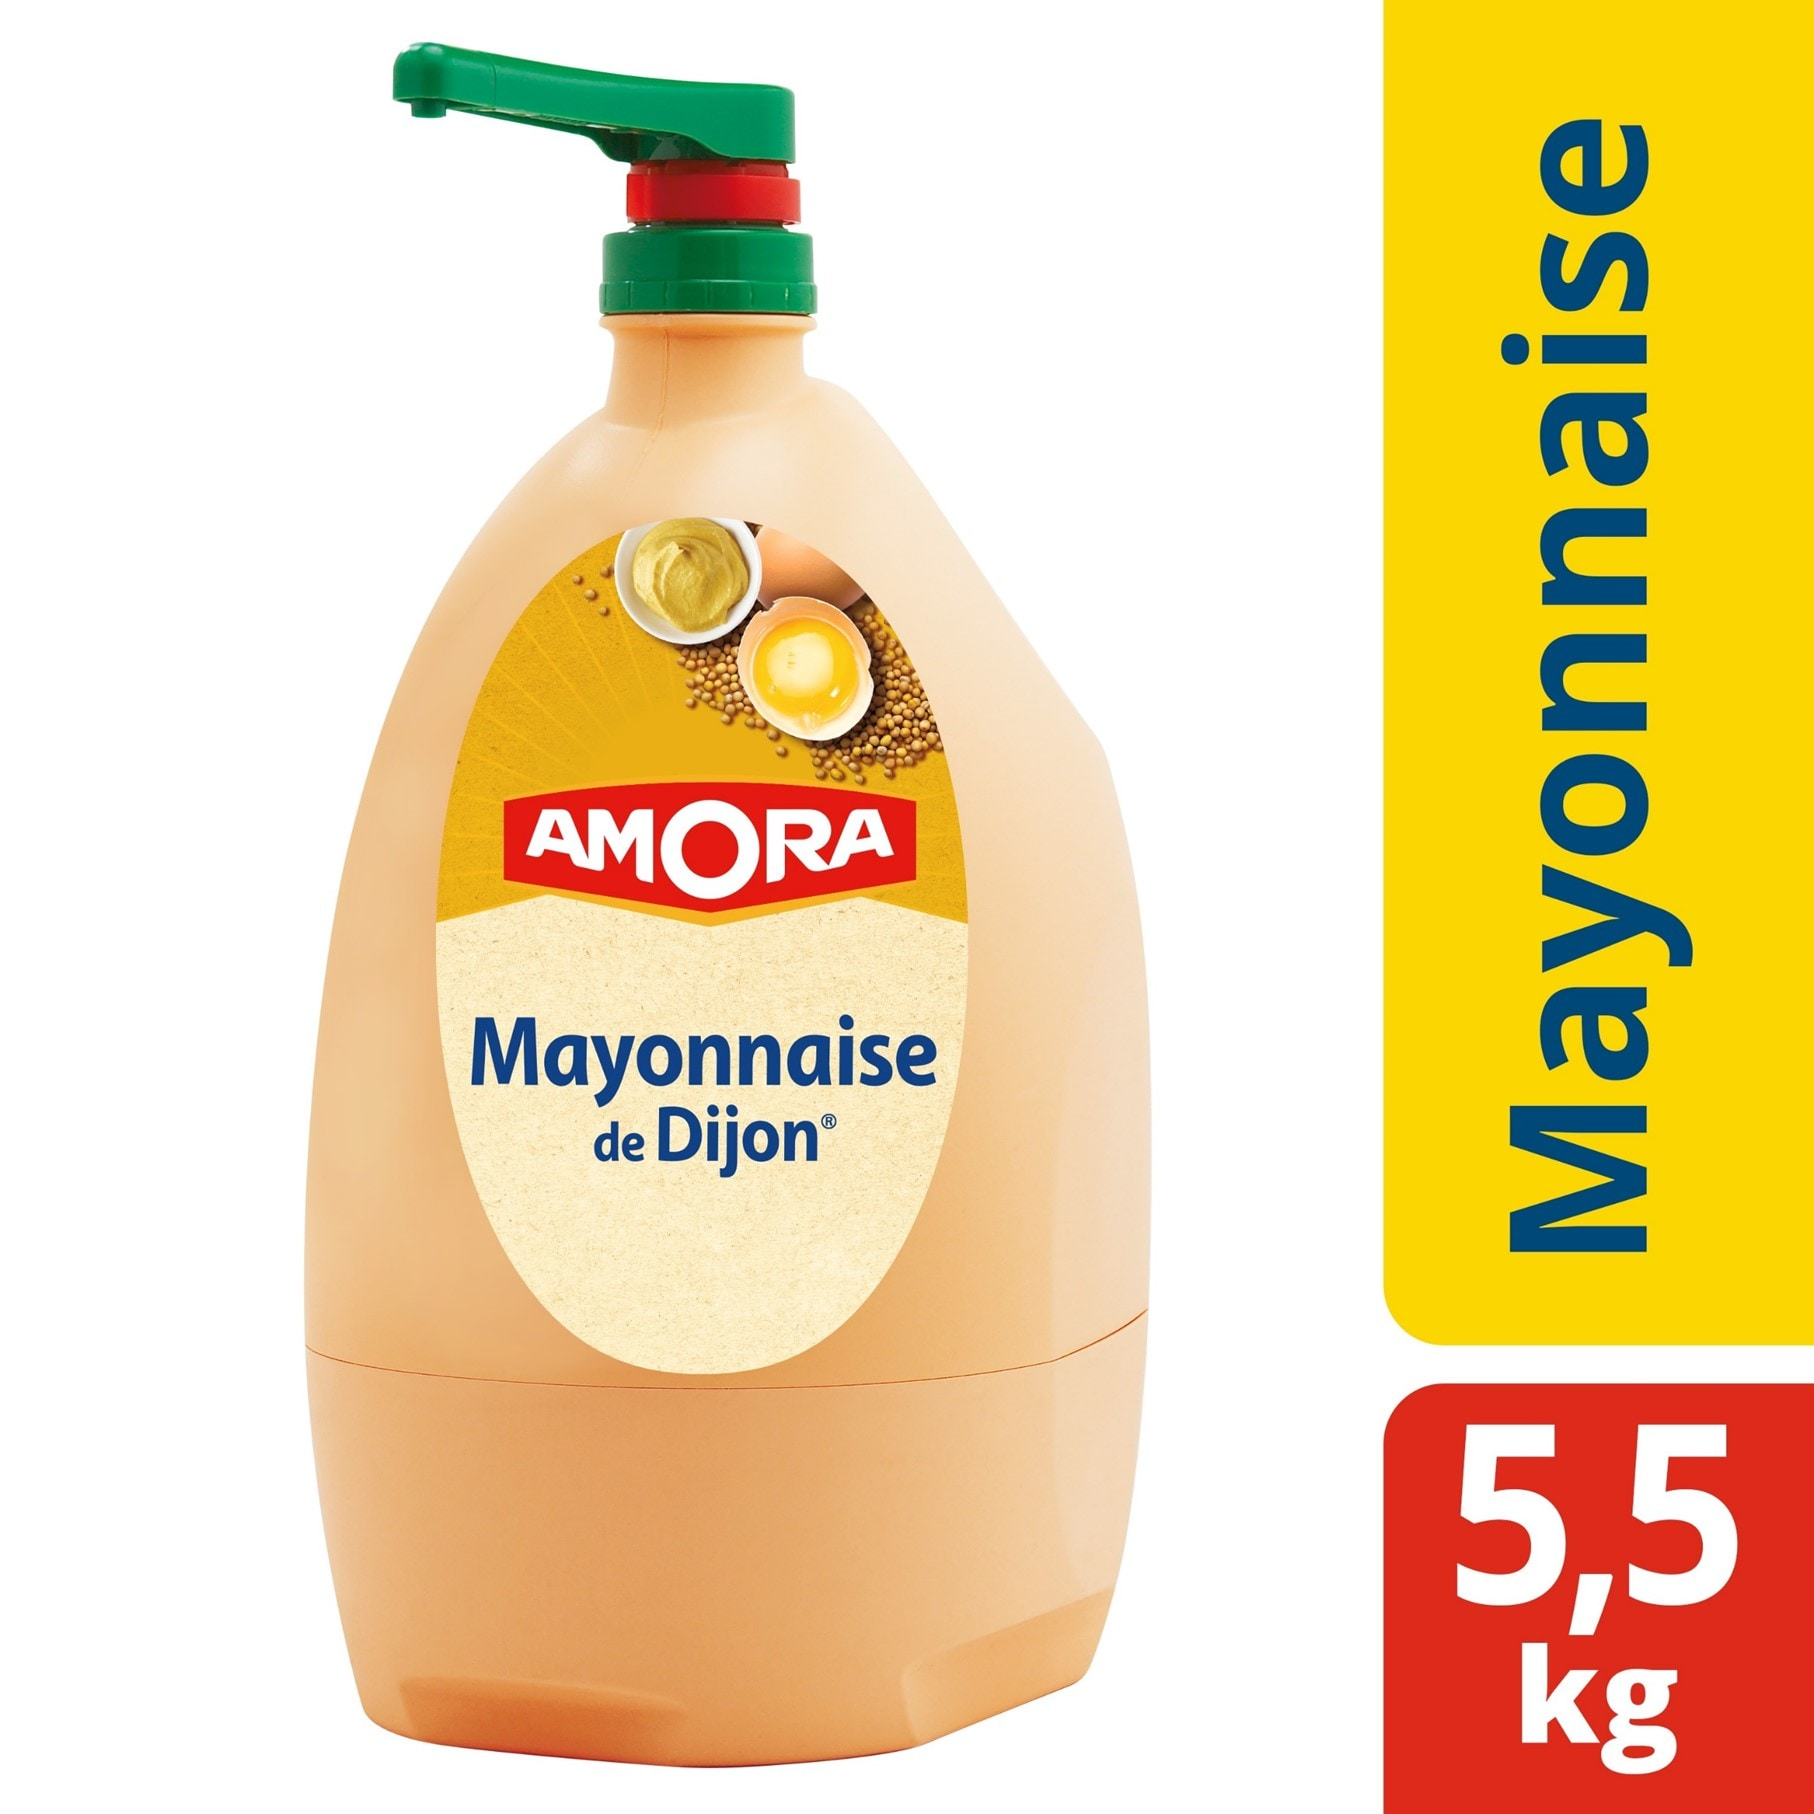 Amora Mayonnaise de Dijon Distributeur Jet Bar 5,5kg -